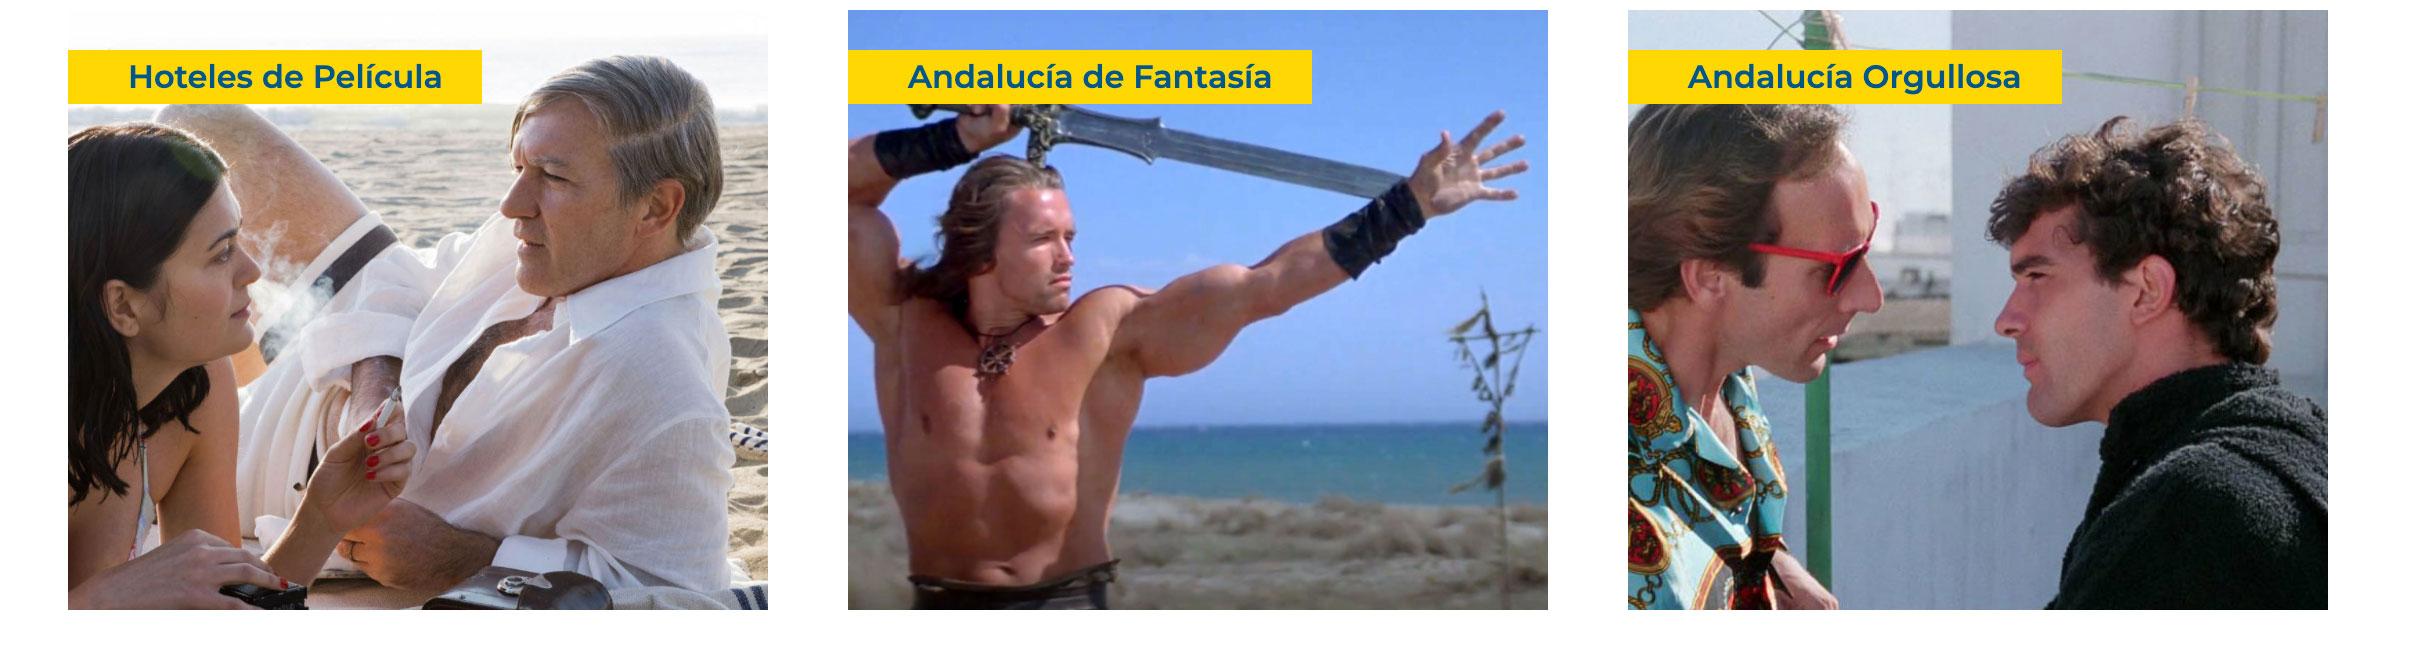 Rutas Nuevas NdP - Andalucía Film Commission